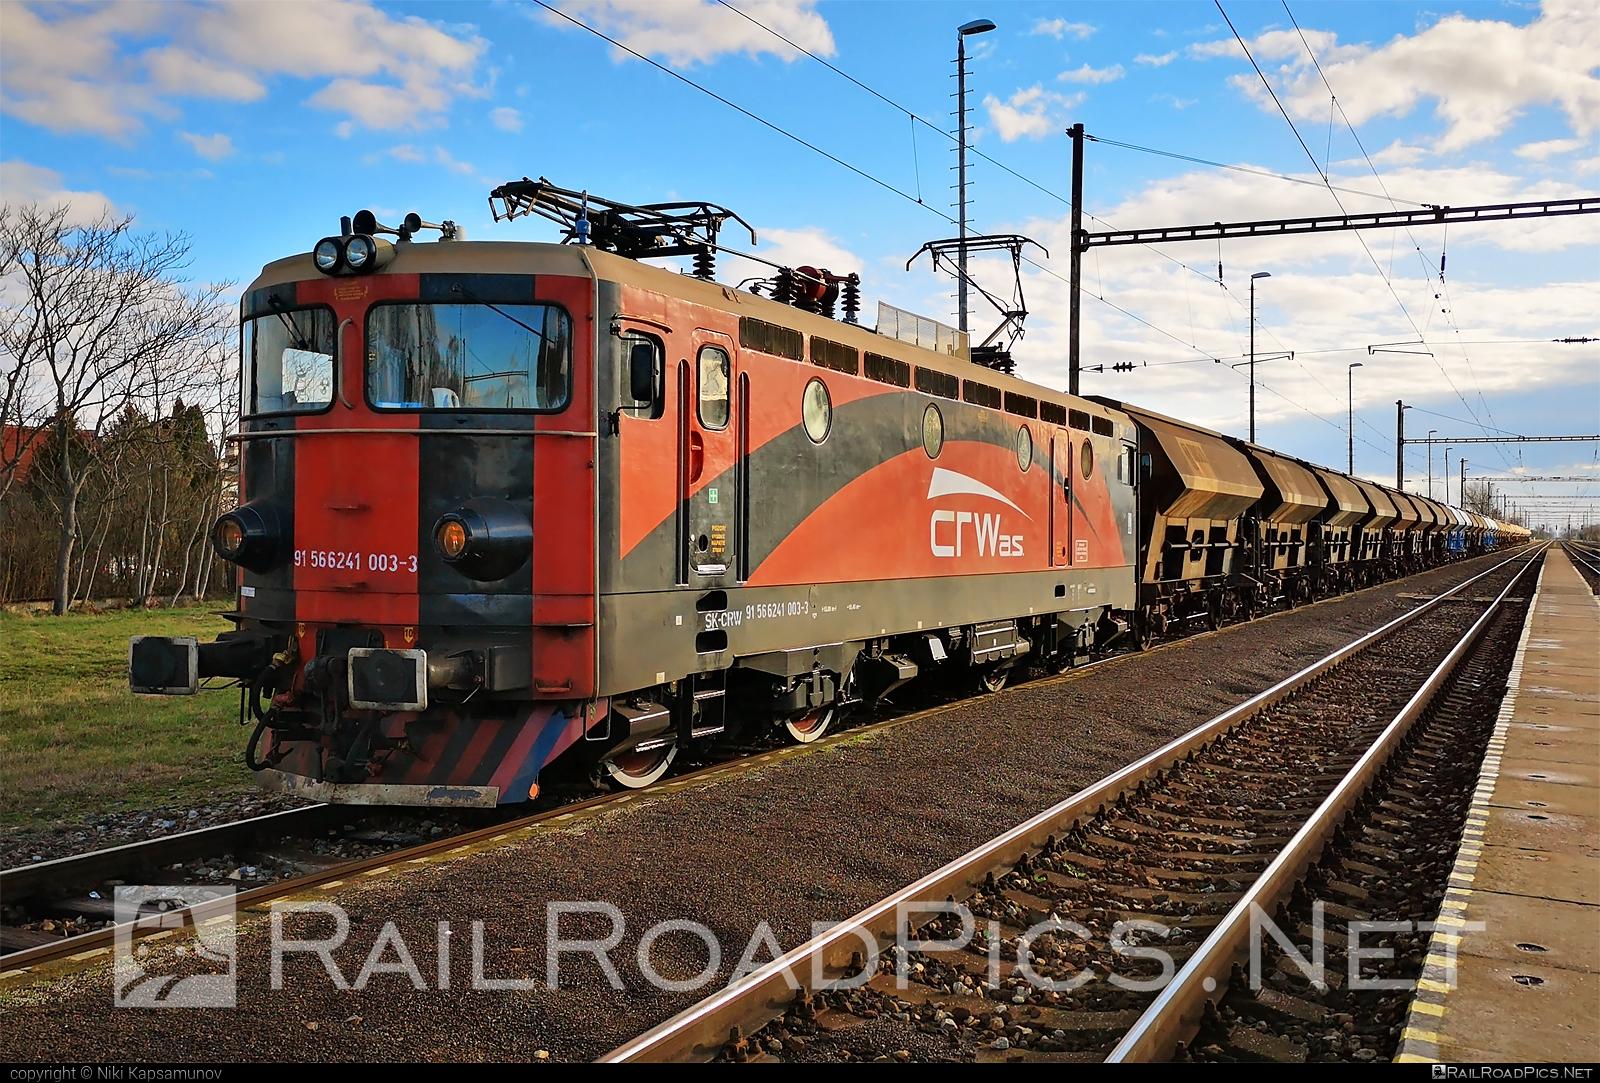 Končar JŽ class 441 - 241 003-3 operated by CENTRAL RAILWAYS s.r.o. #crw #duslo #electroputere #hopperwagon #jz441 #koncar #koncar441